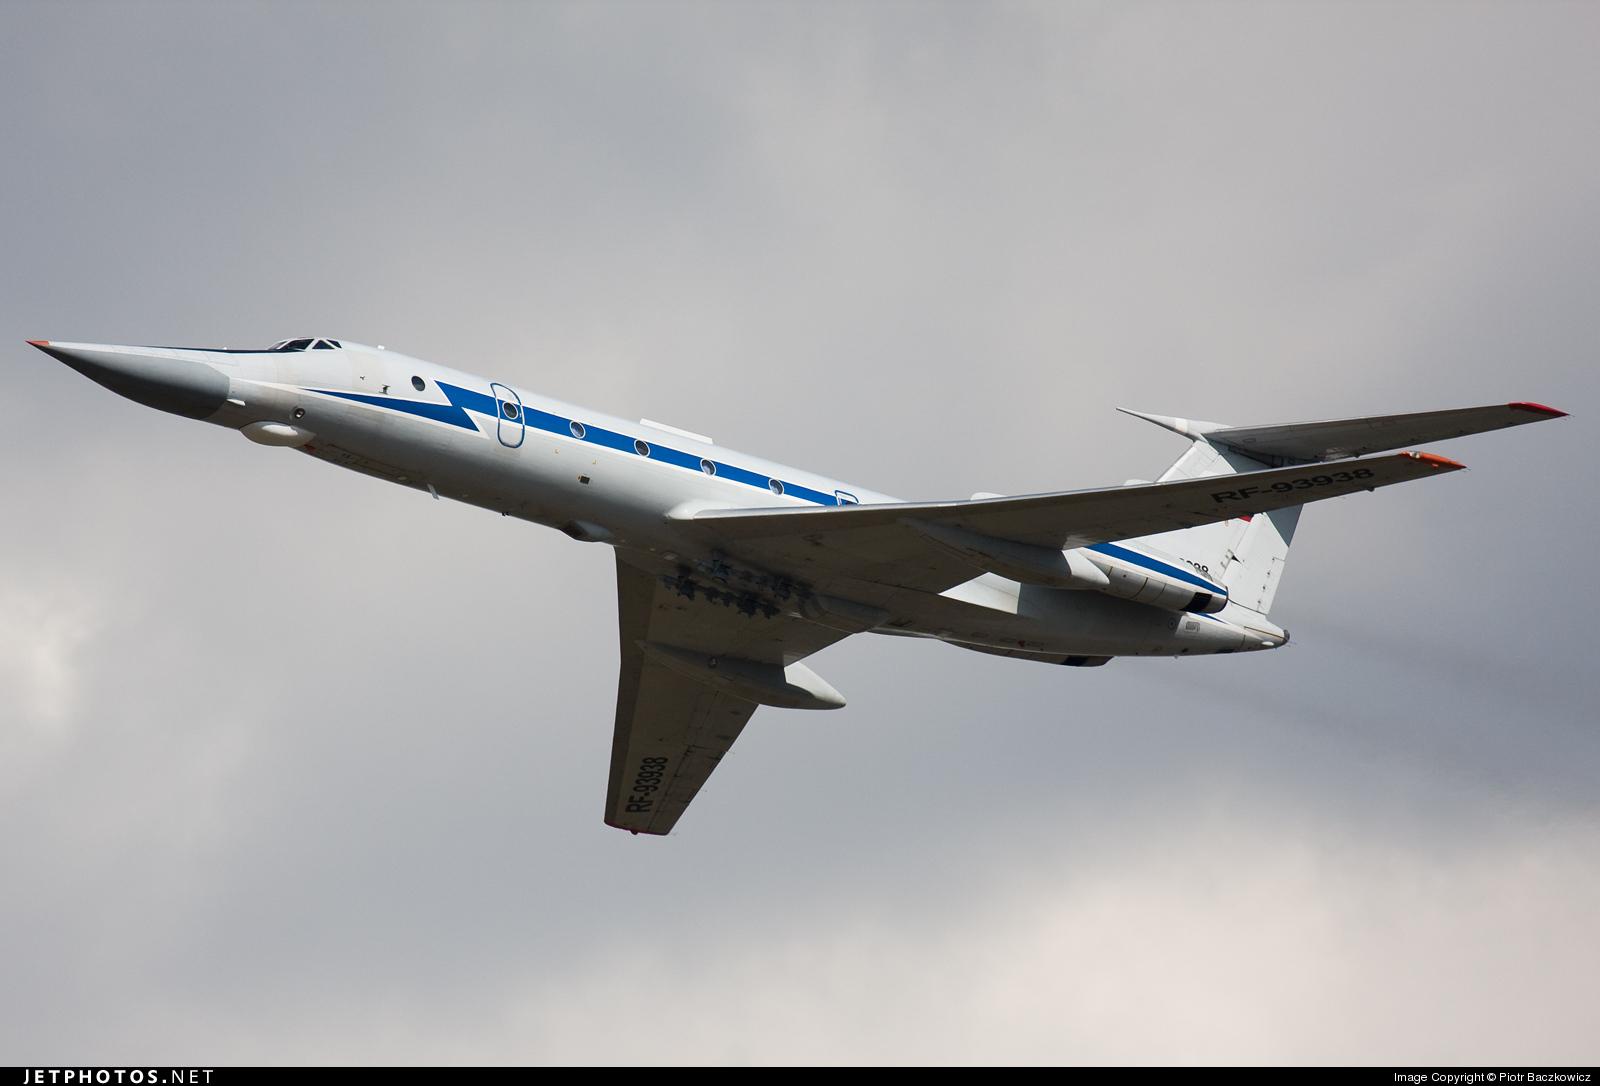 RF-93938 - Tupolev Tu-134UBL - Russia - Air Force